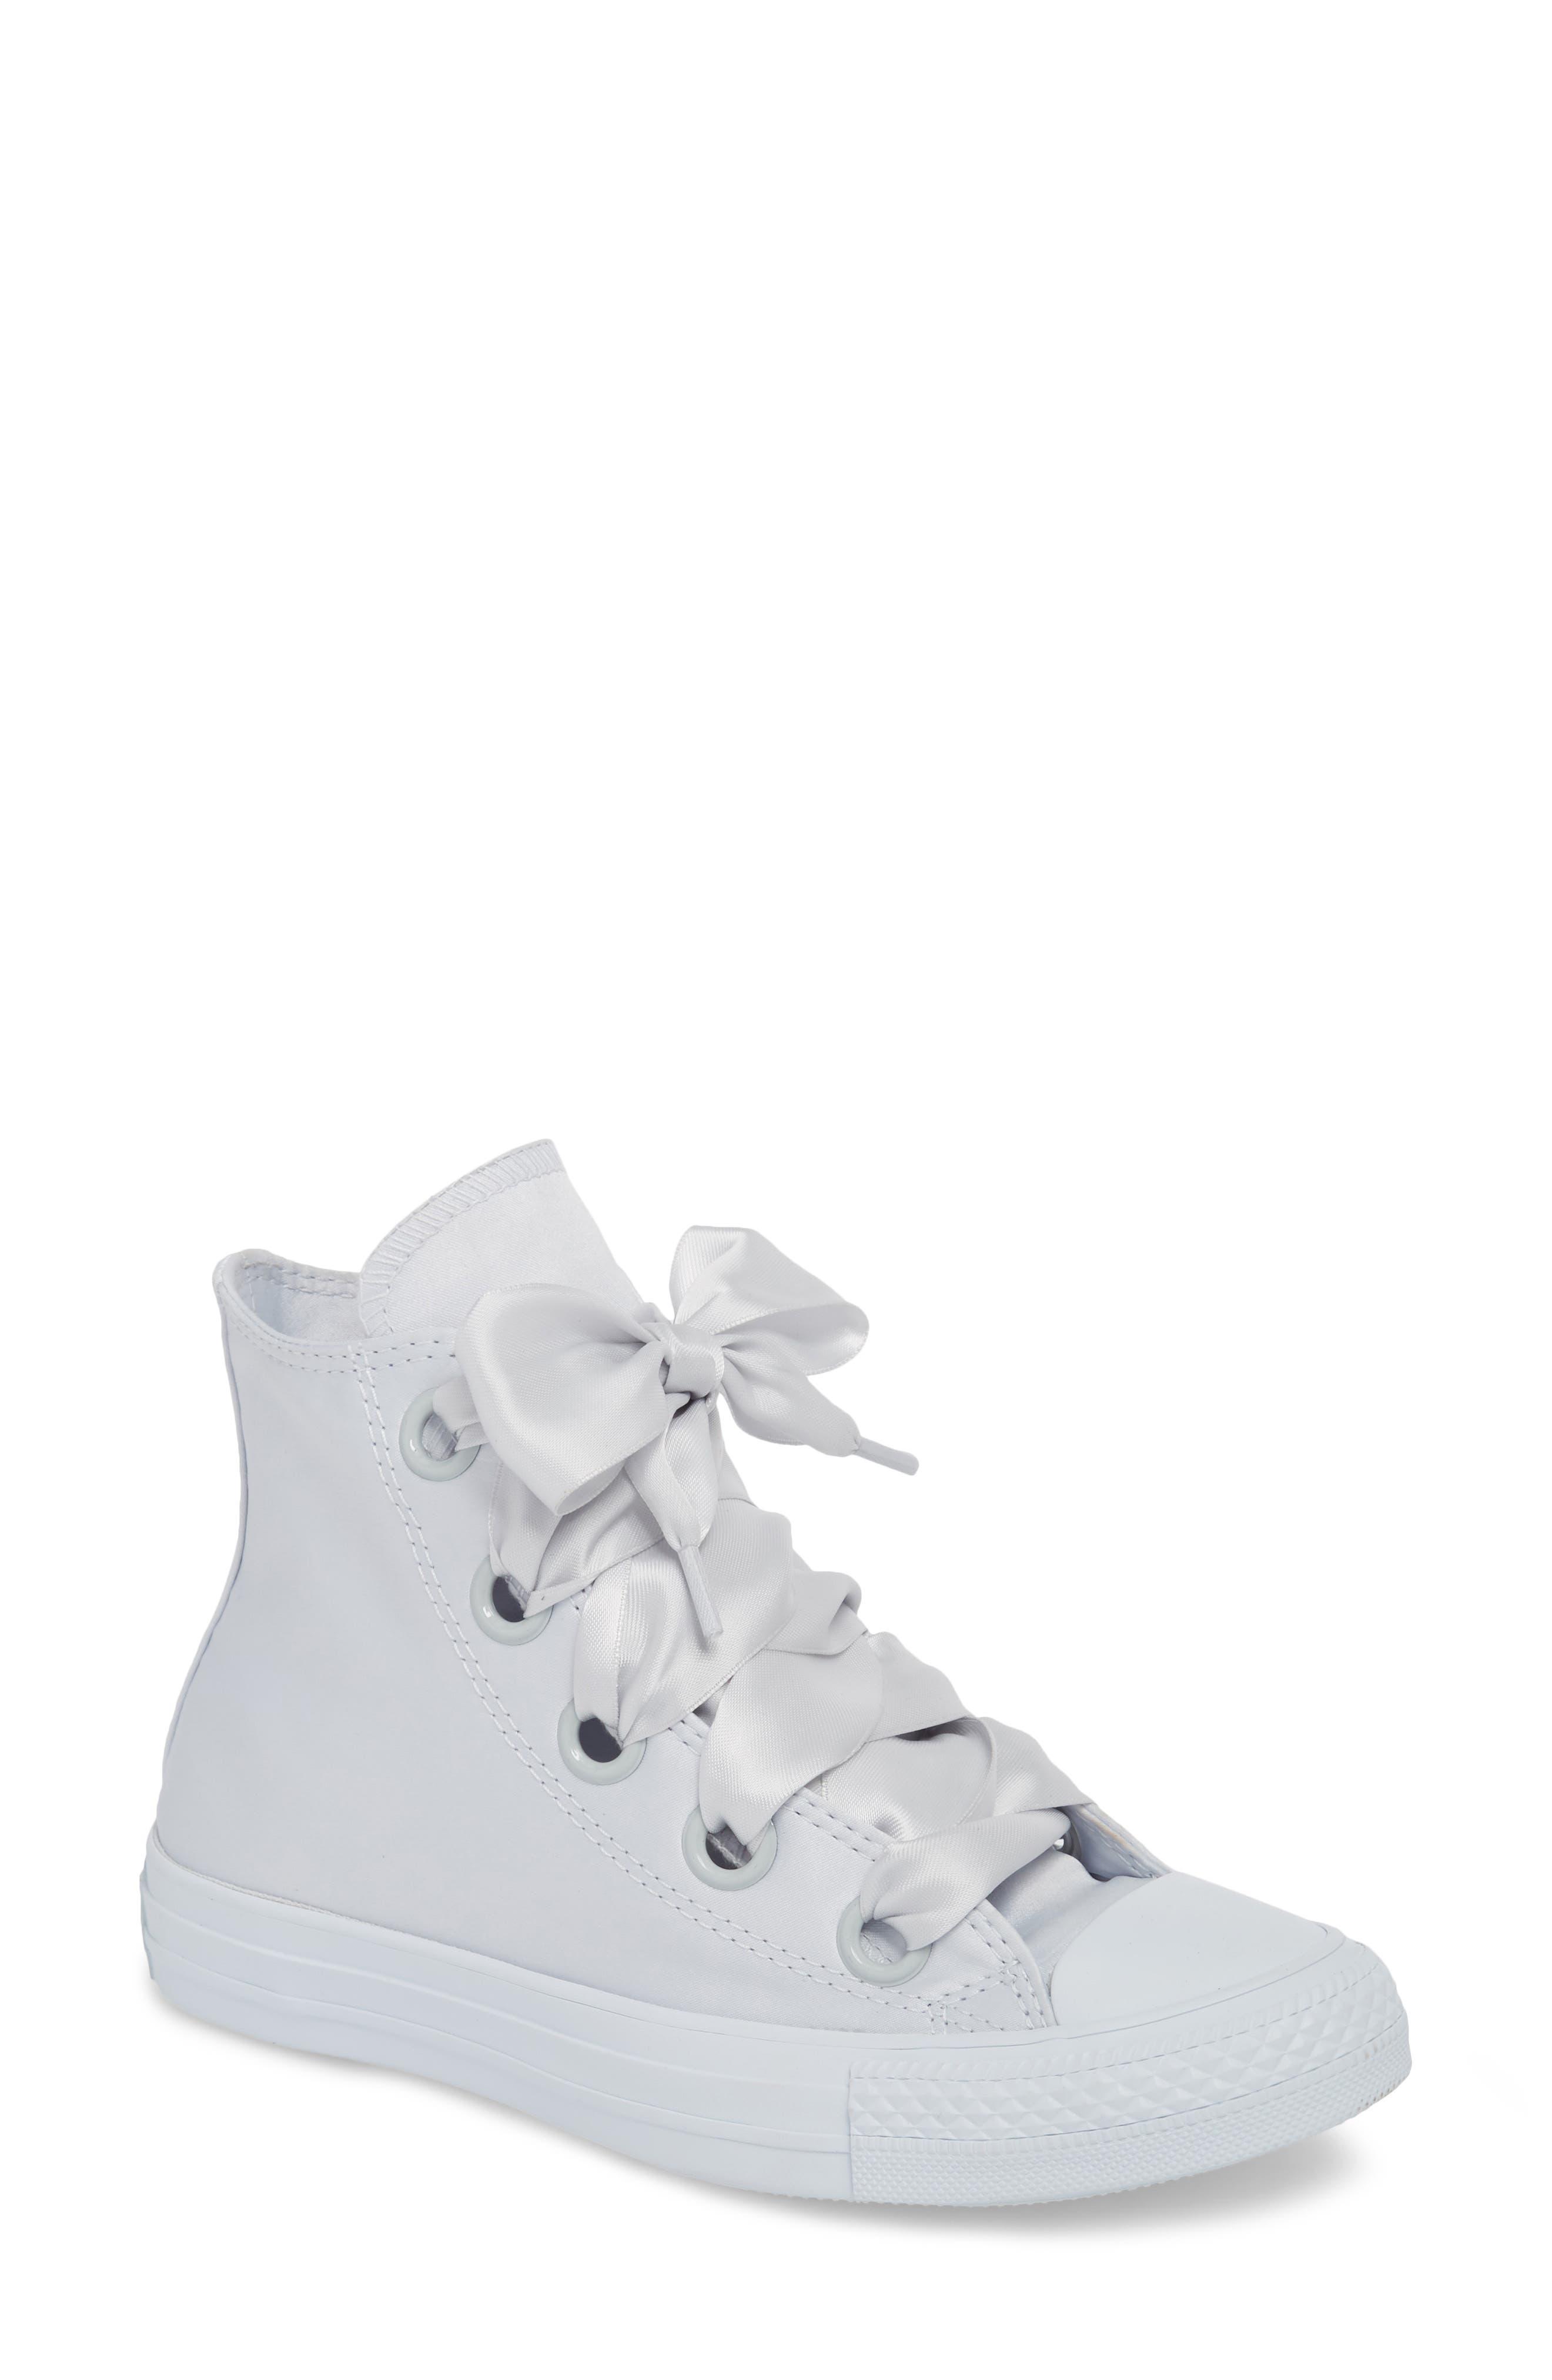 Chuck Taylor<sup>®</sup> All Star<sup>®</sup> Big Eyelet High Top Sneaker,                         Main,                         color, Platinum